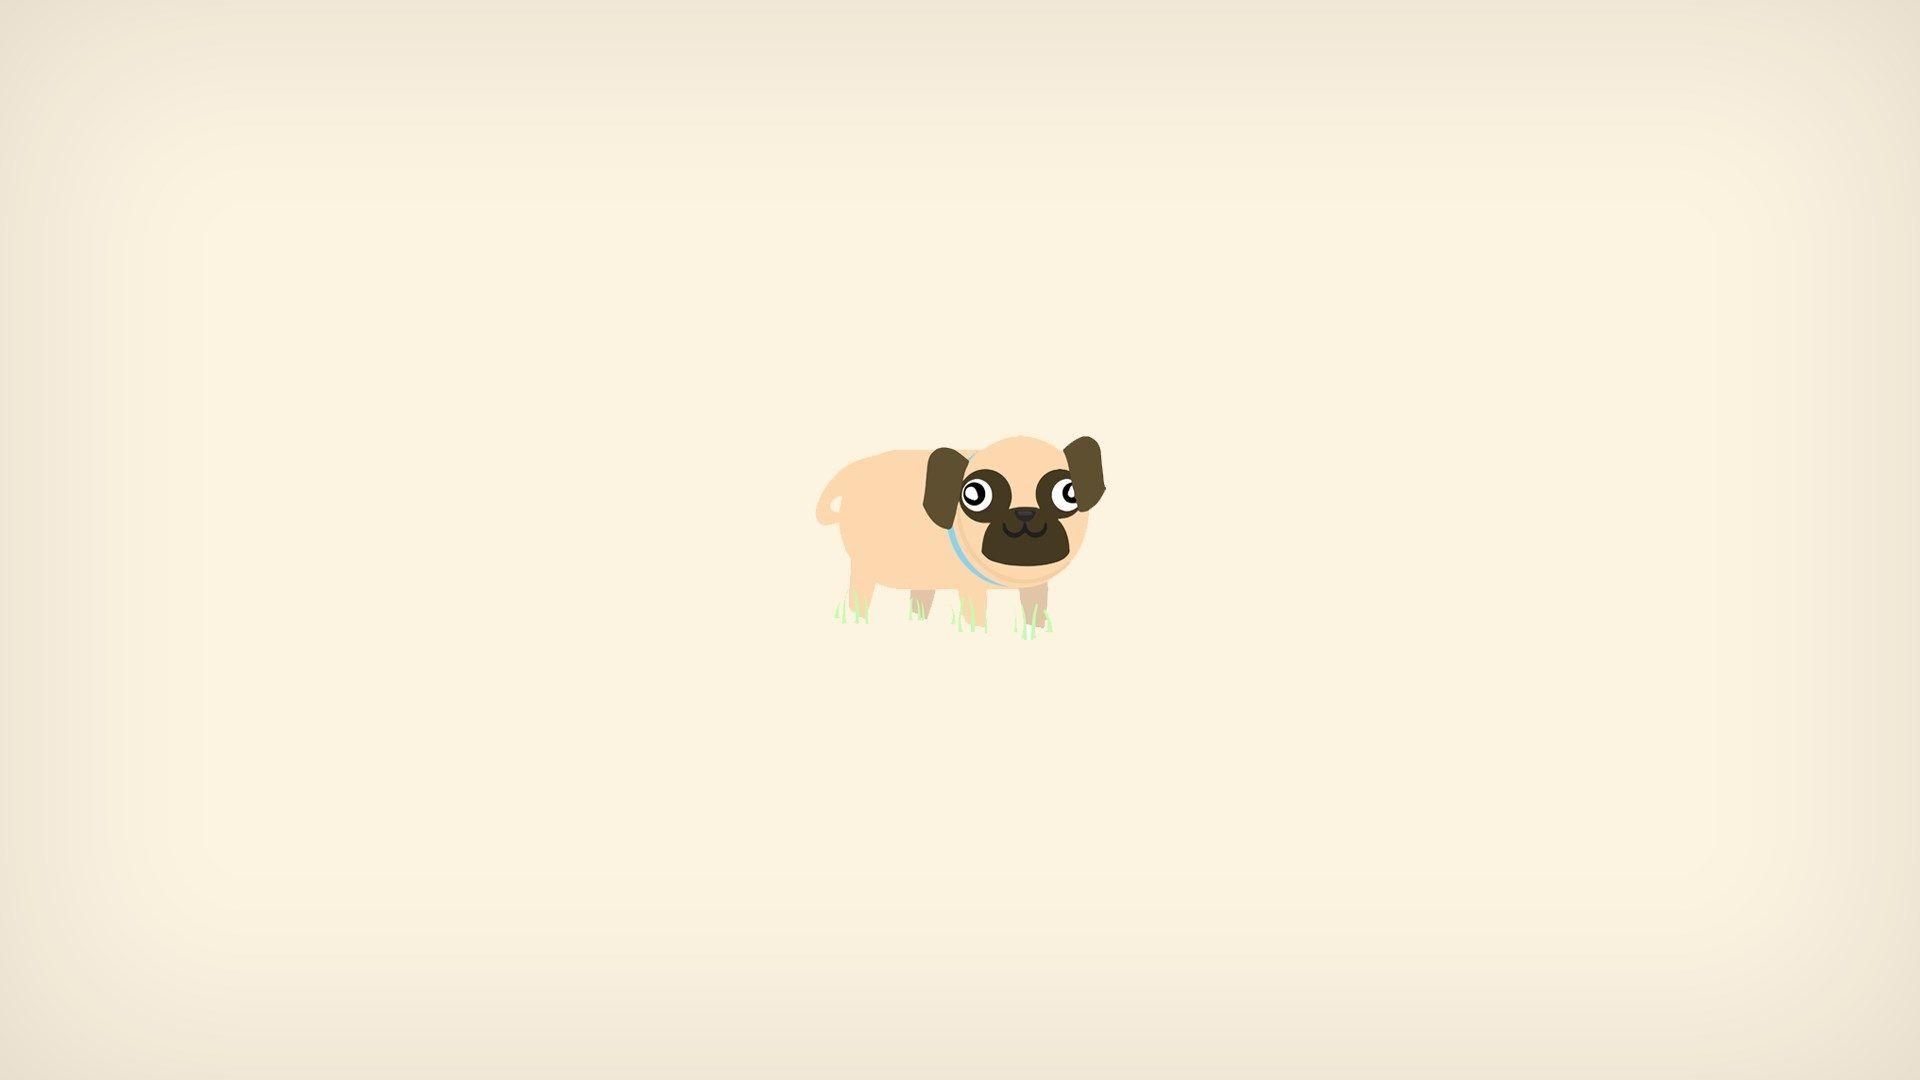 1920x1080 pug computer wallpaper free Dog wallpaper, Pug